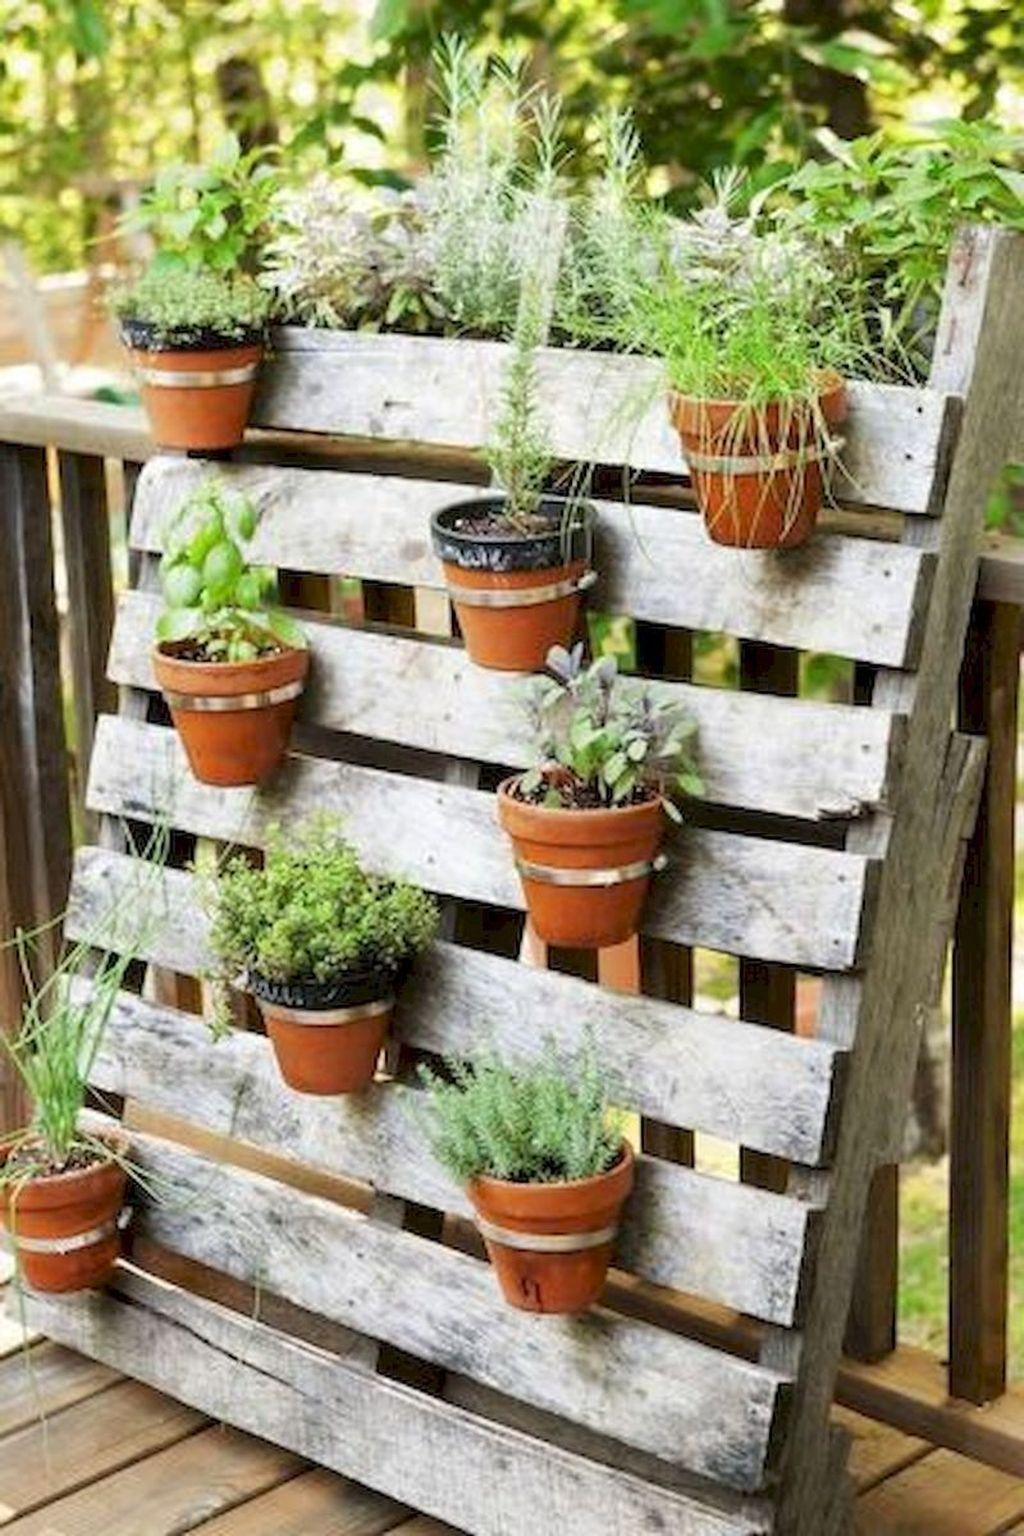 Brilliant Diy Projects Pallet Garden Design Ideas On A Budget 29